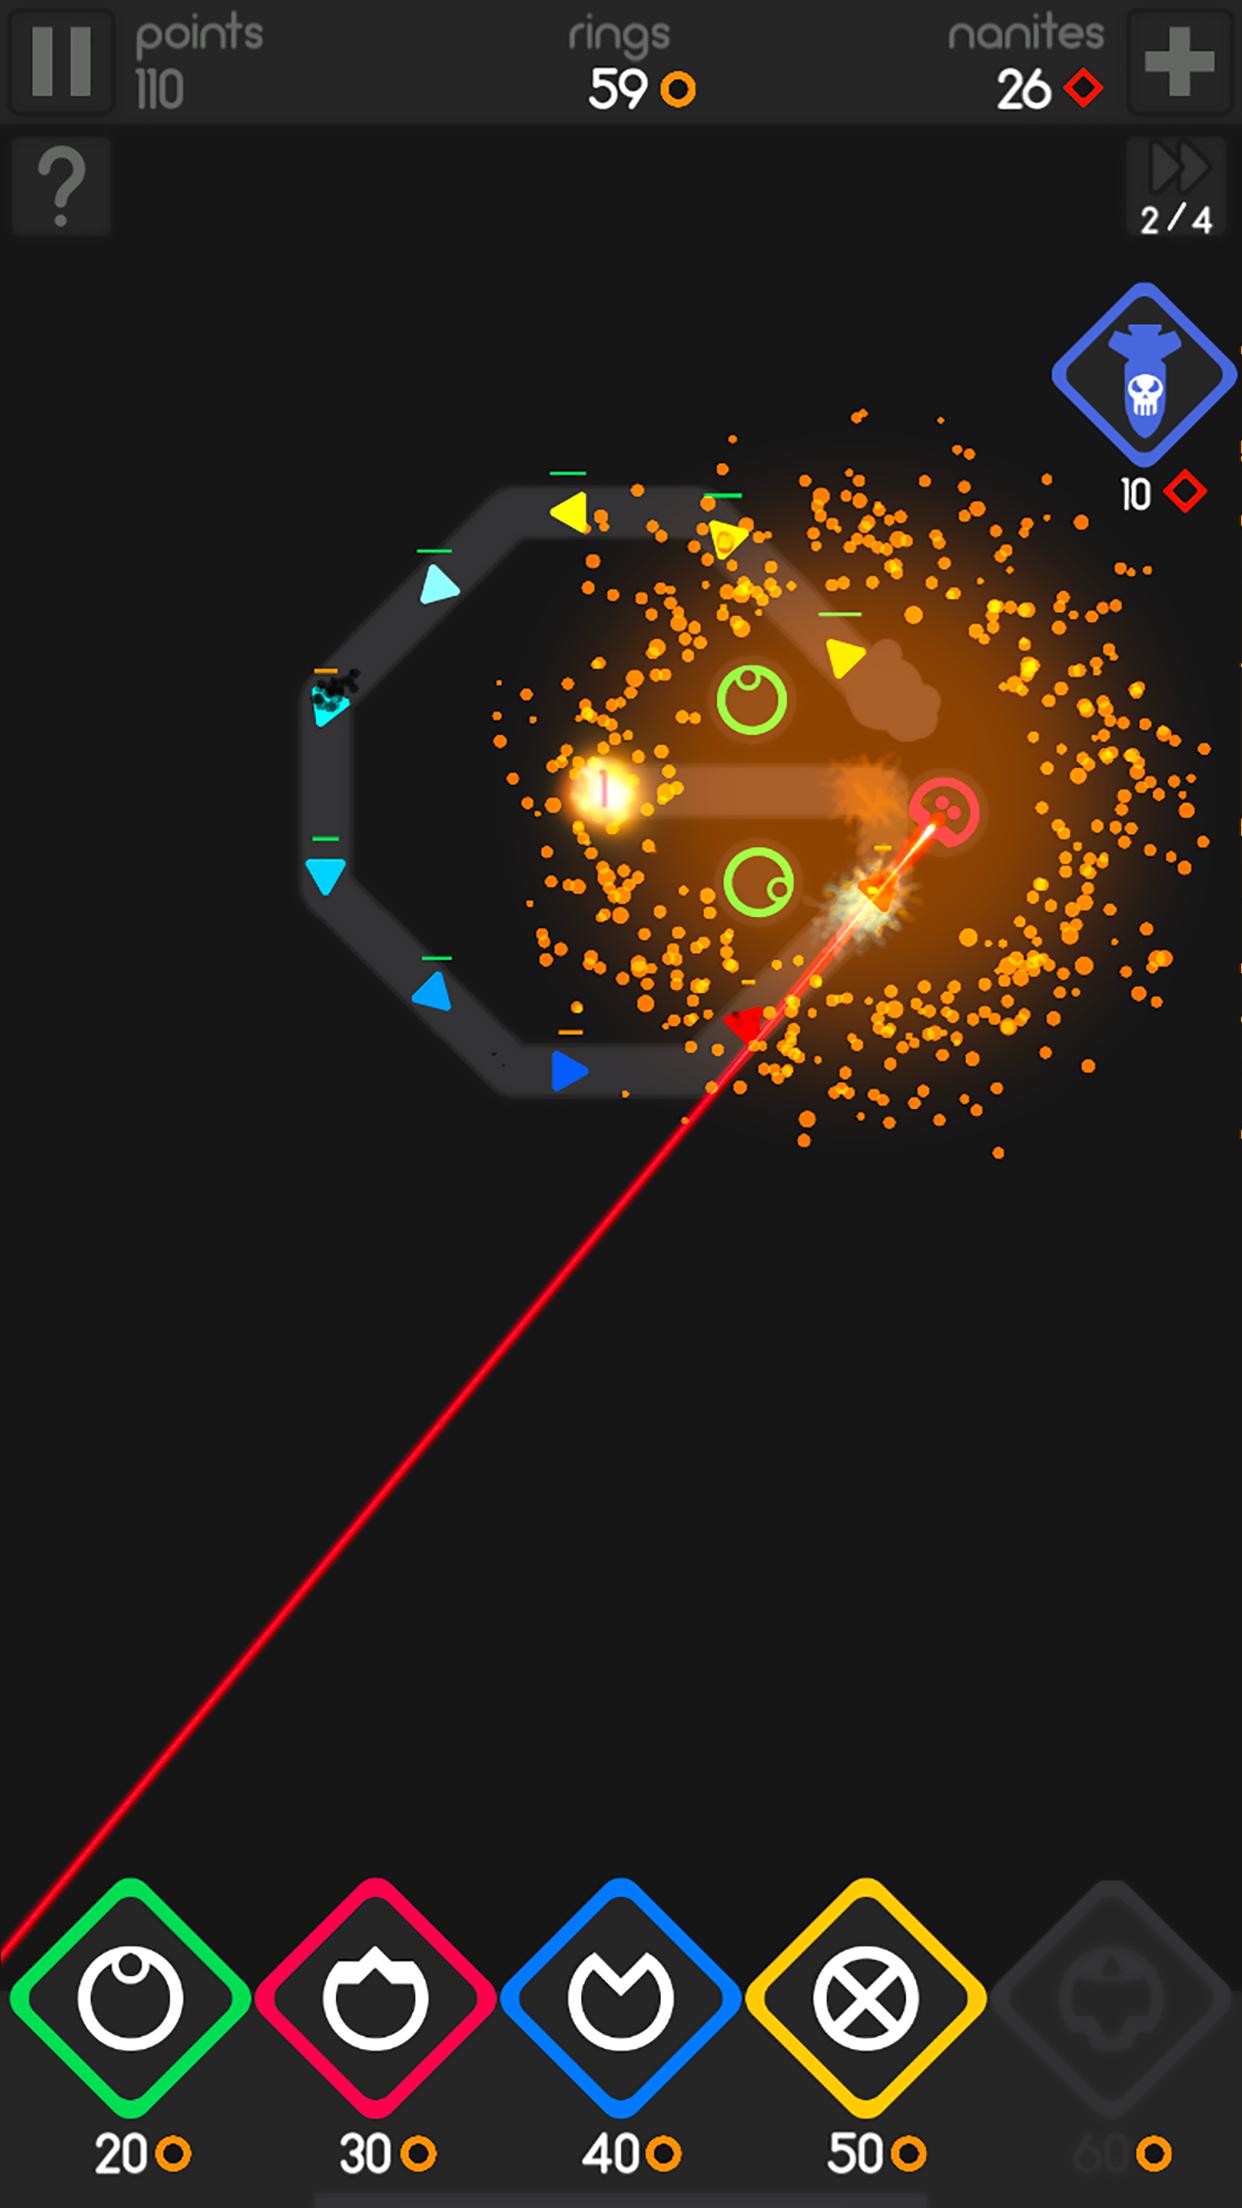 Color_Defense_GooglePlay_screen.3.png